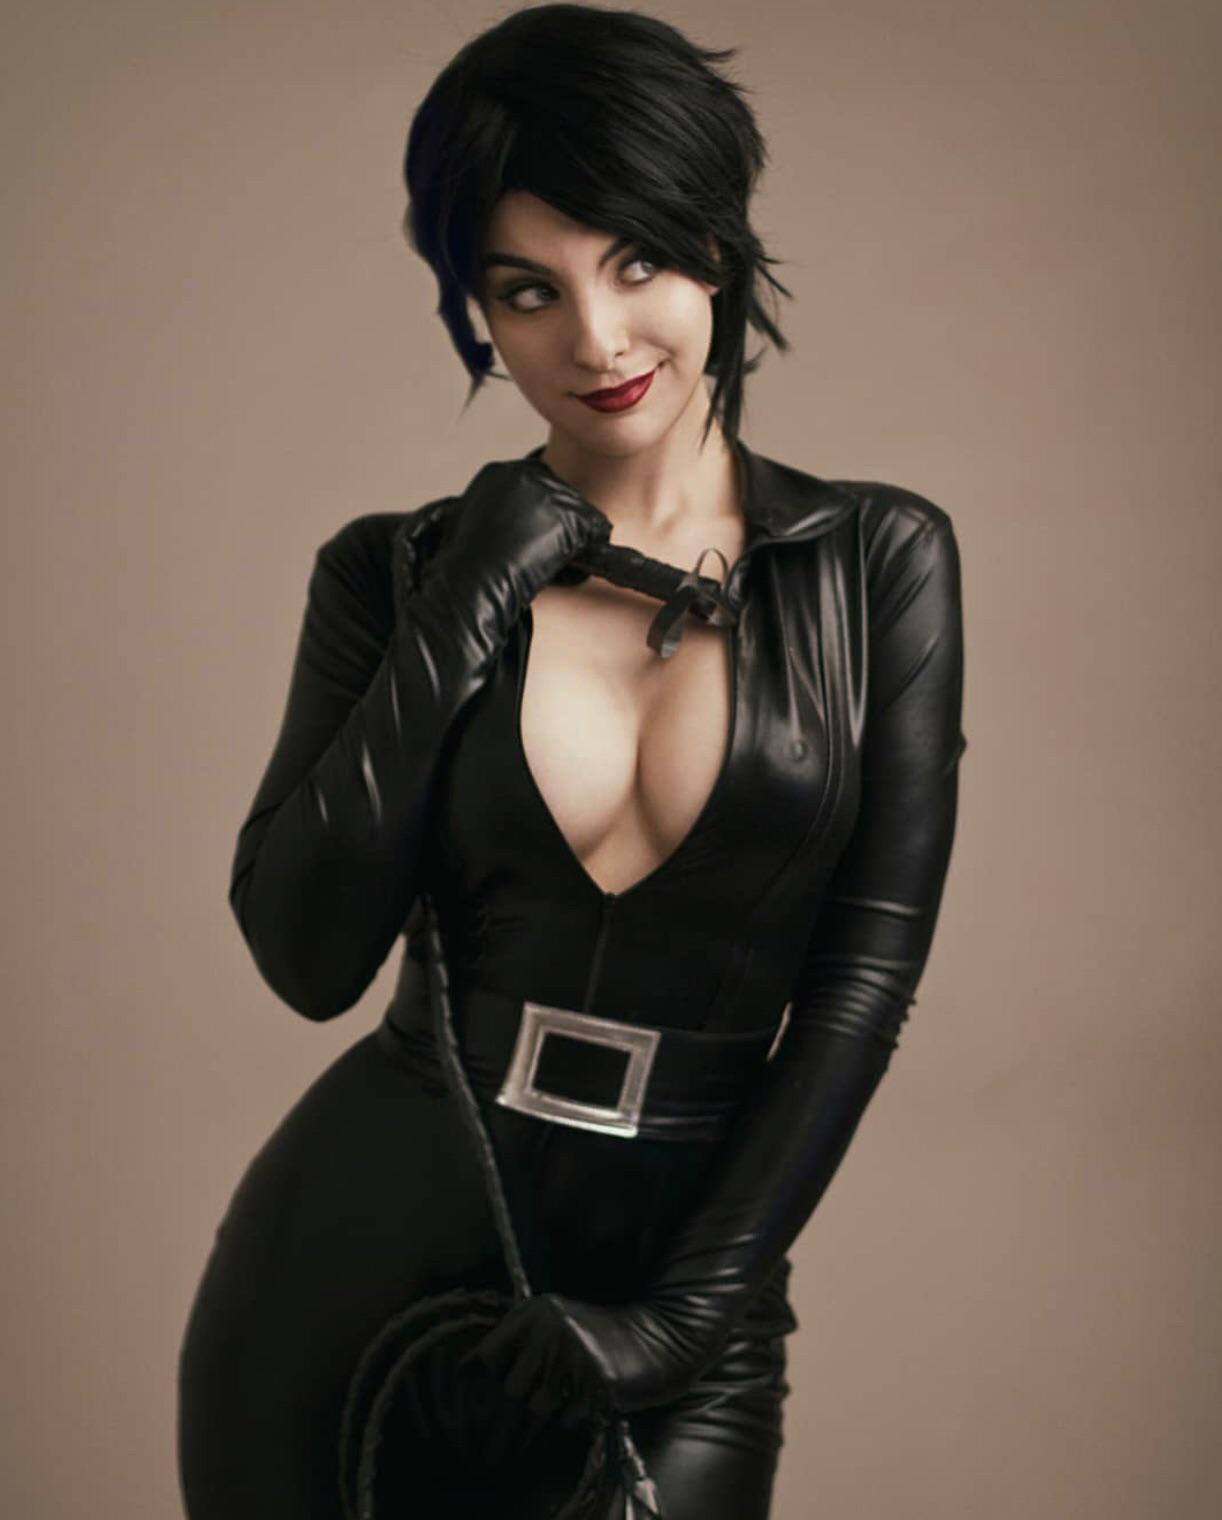 Selina Kyle From Gotham City Sirens By Valentina Kryp